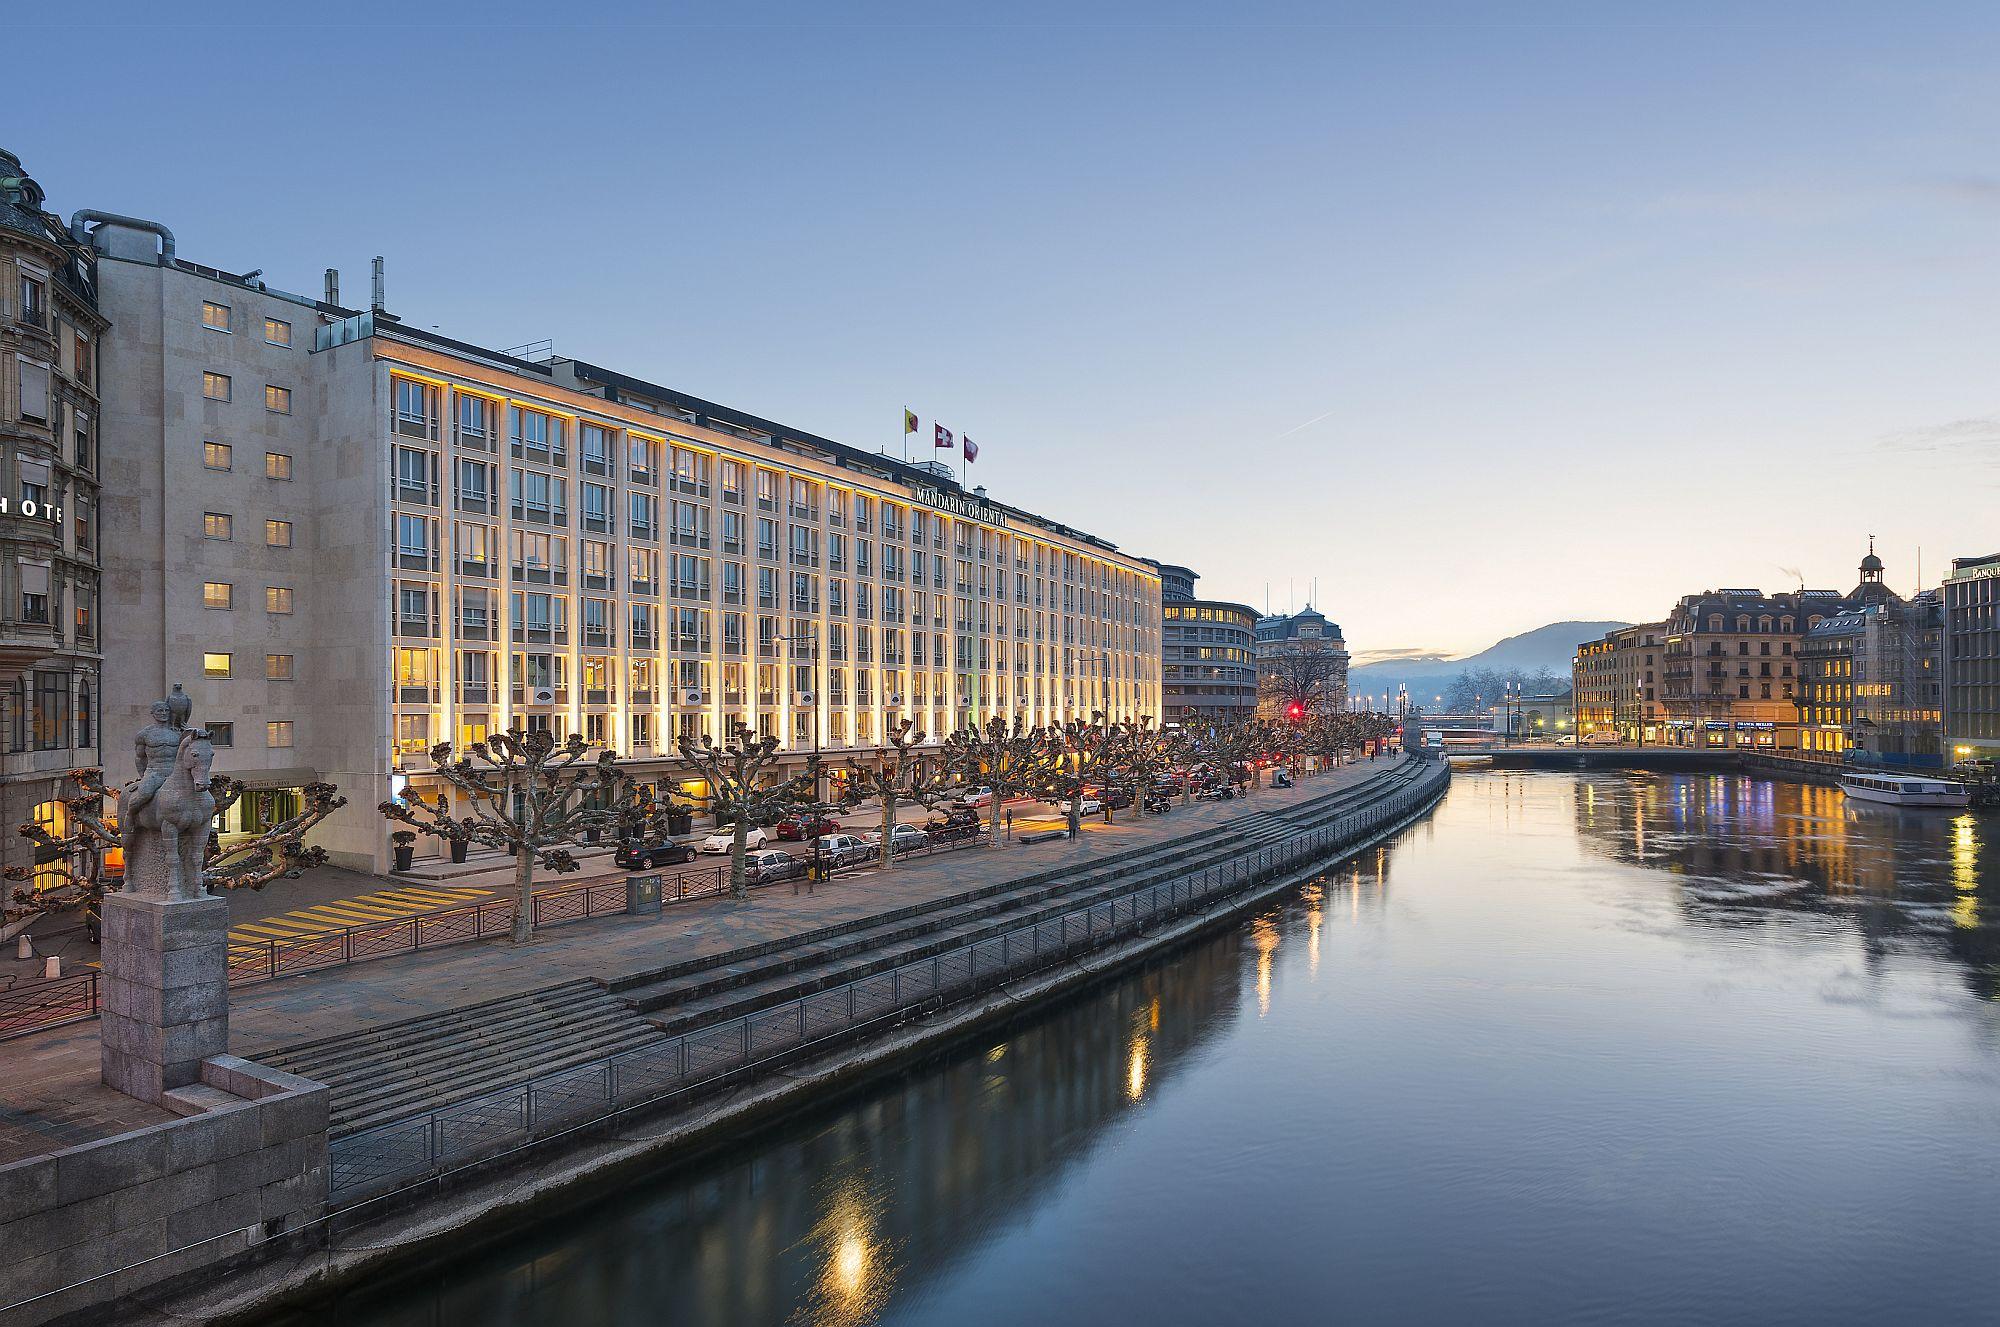 Amazing luxury hotel with lake view in Geneva - Mandarin Oriental